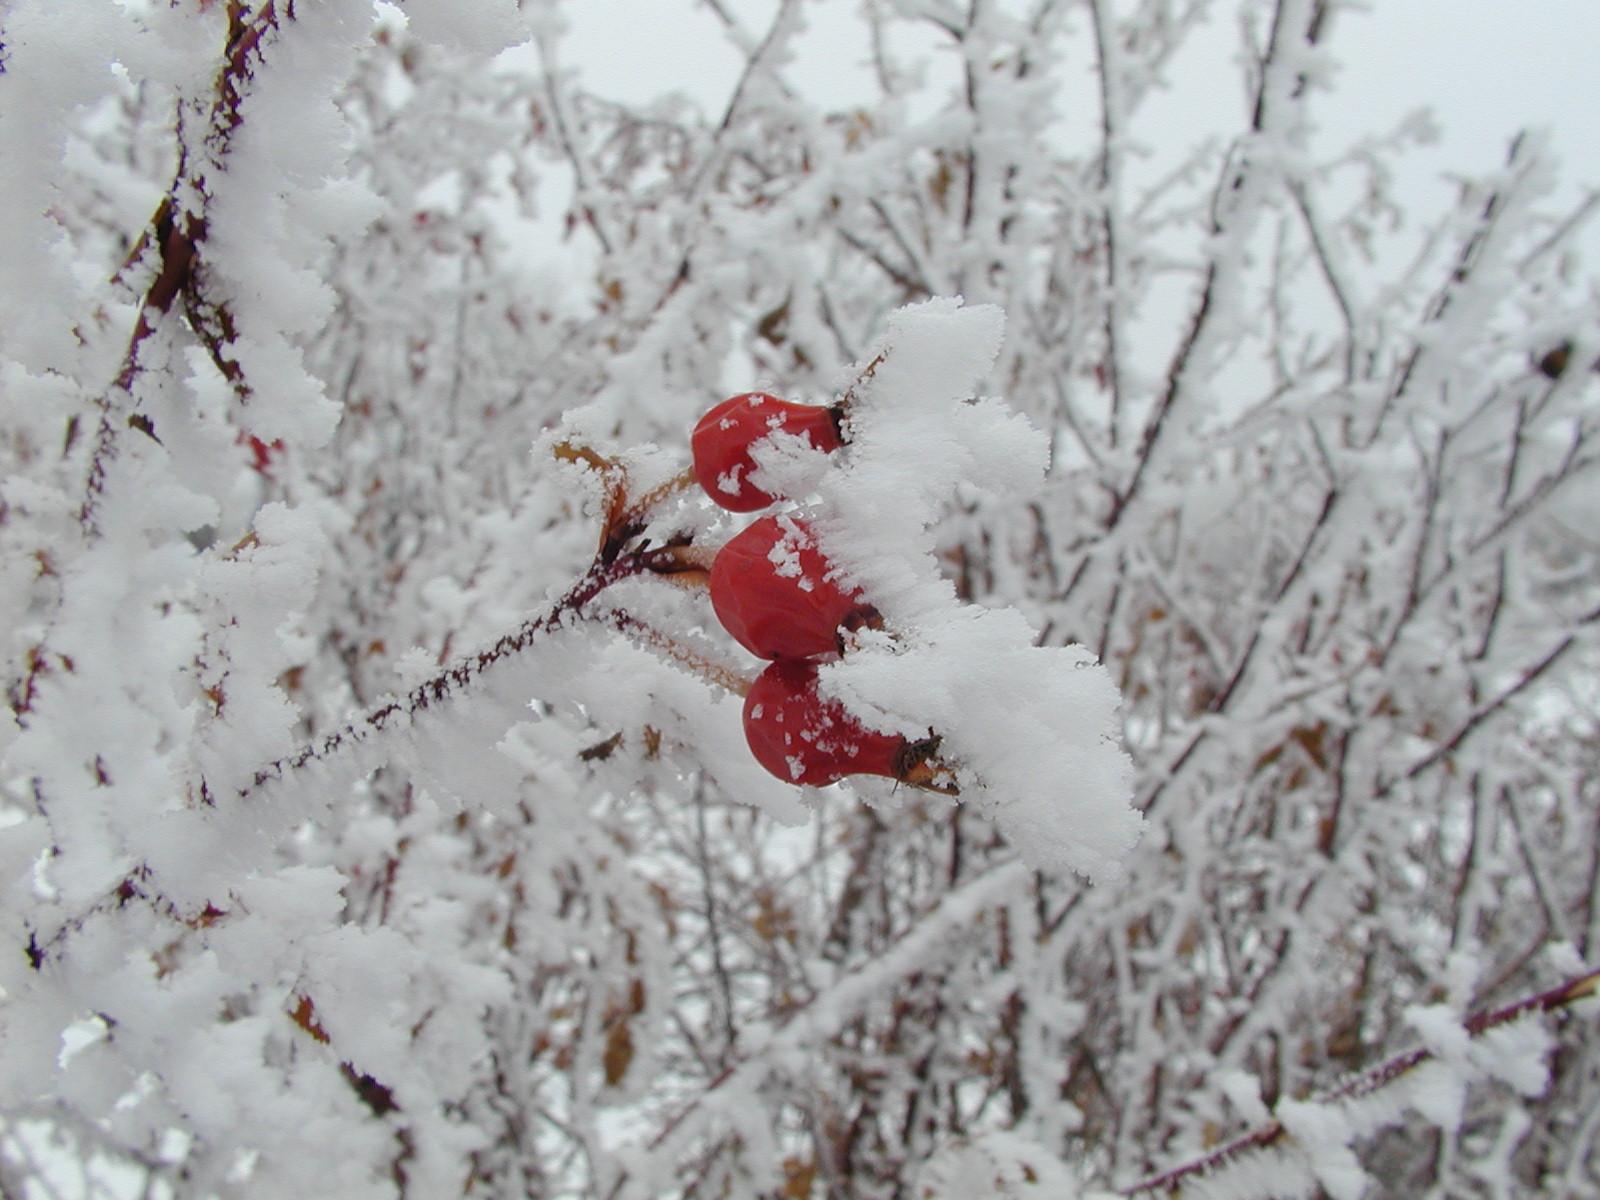 Rose hips in snow.